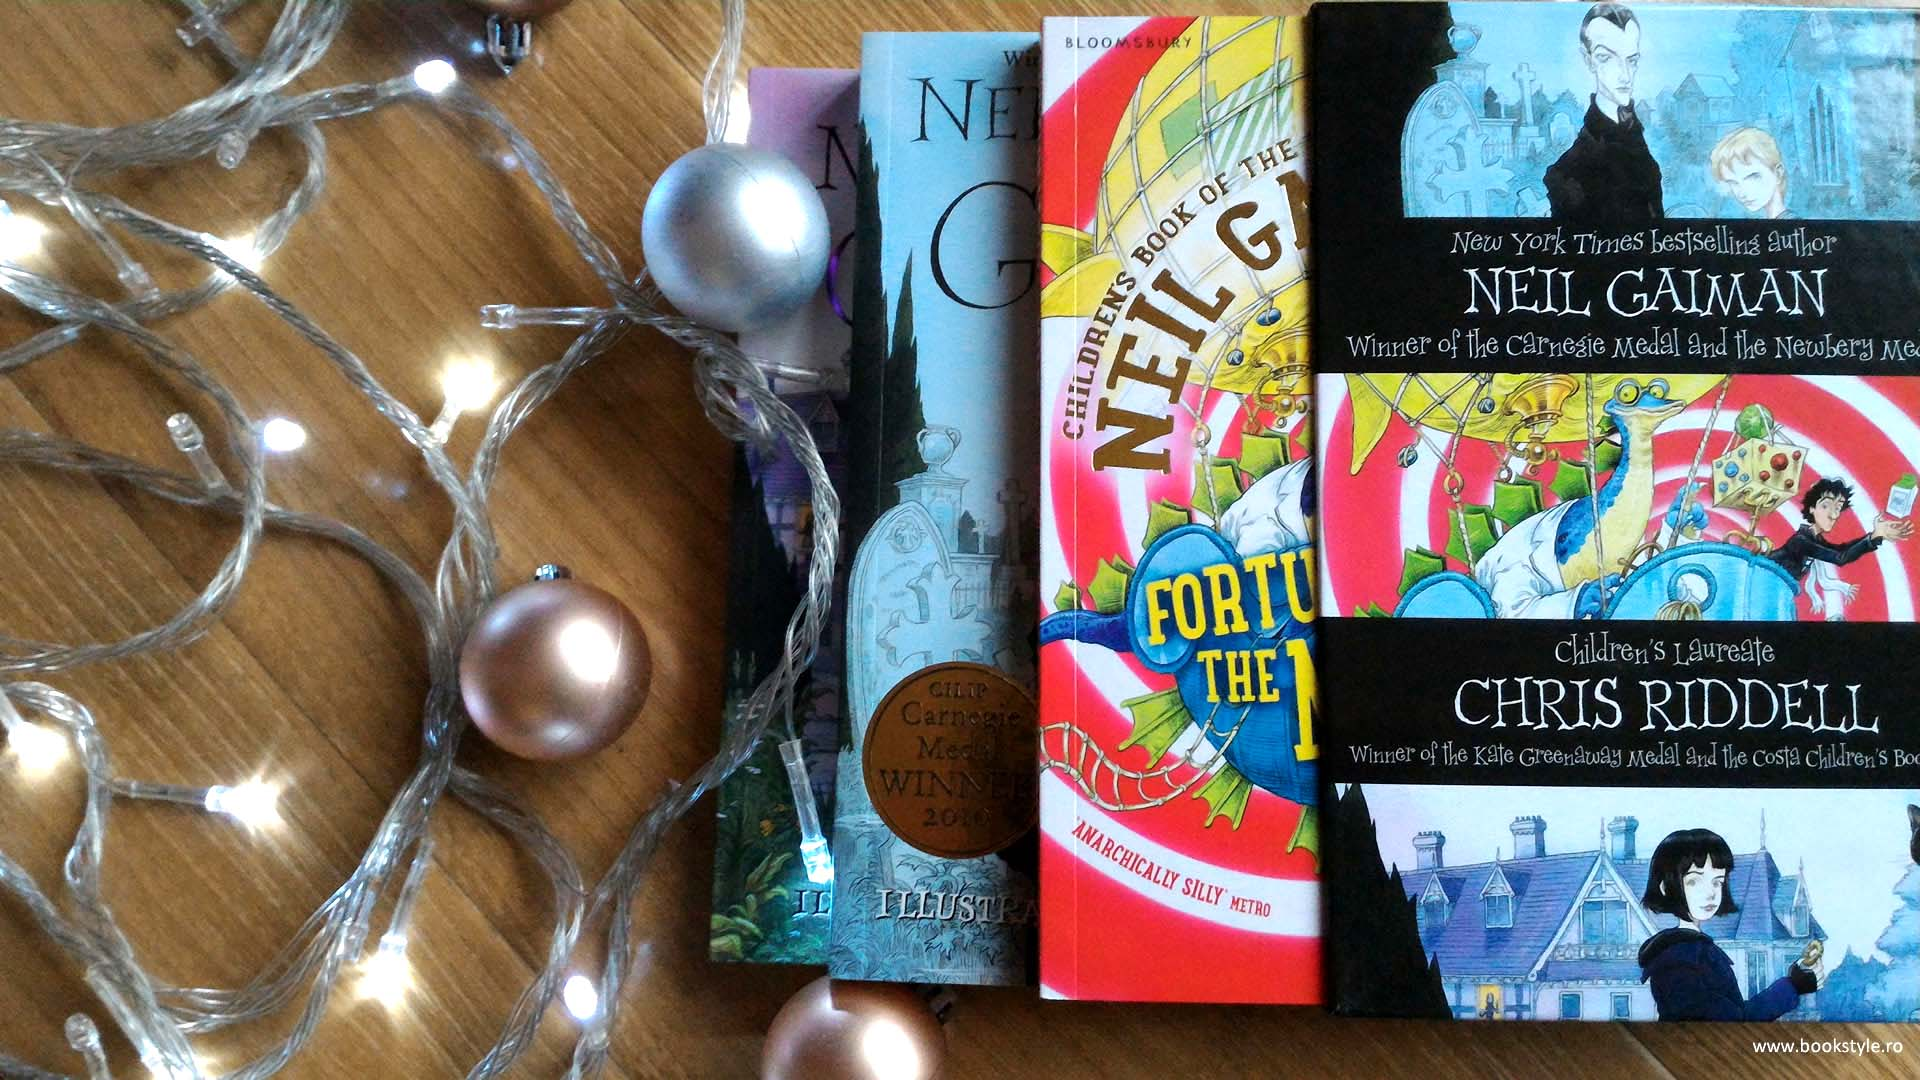 Fortunately the milk | The Graveyard Book | Coraline - Neil Gaiman - Children book boxset - Illustrated book by Chris Riddell